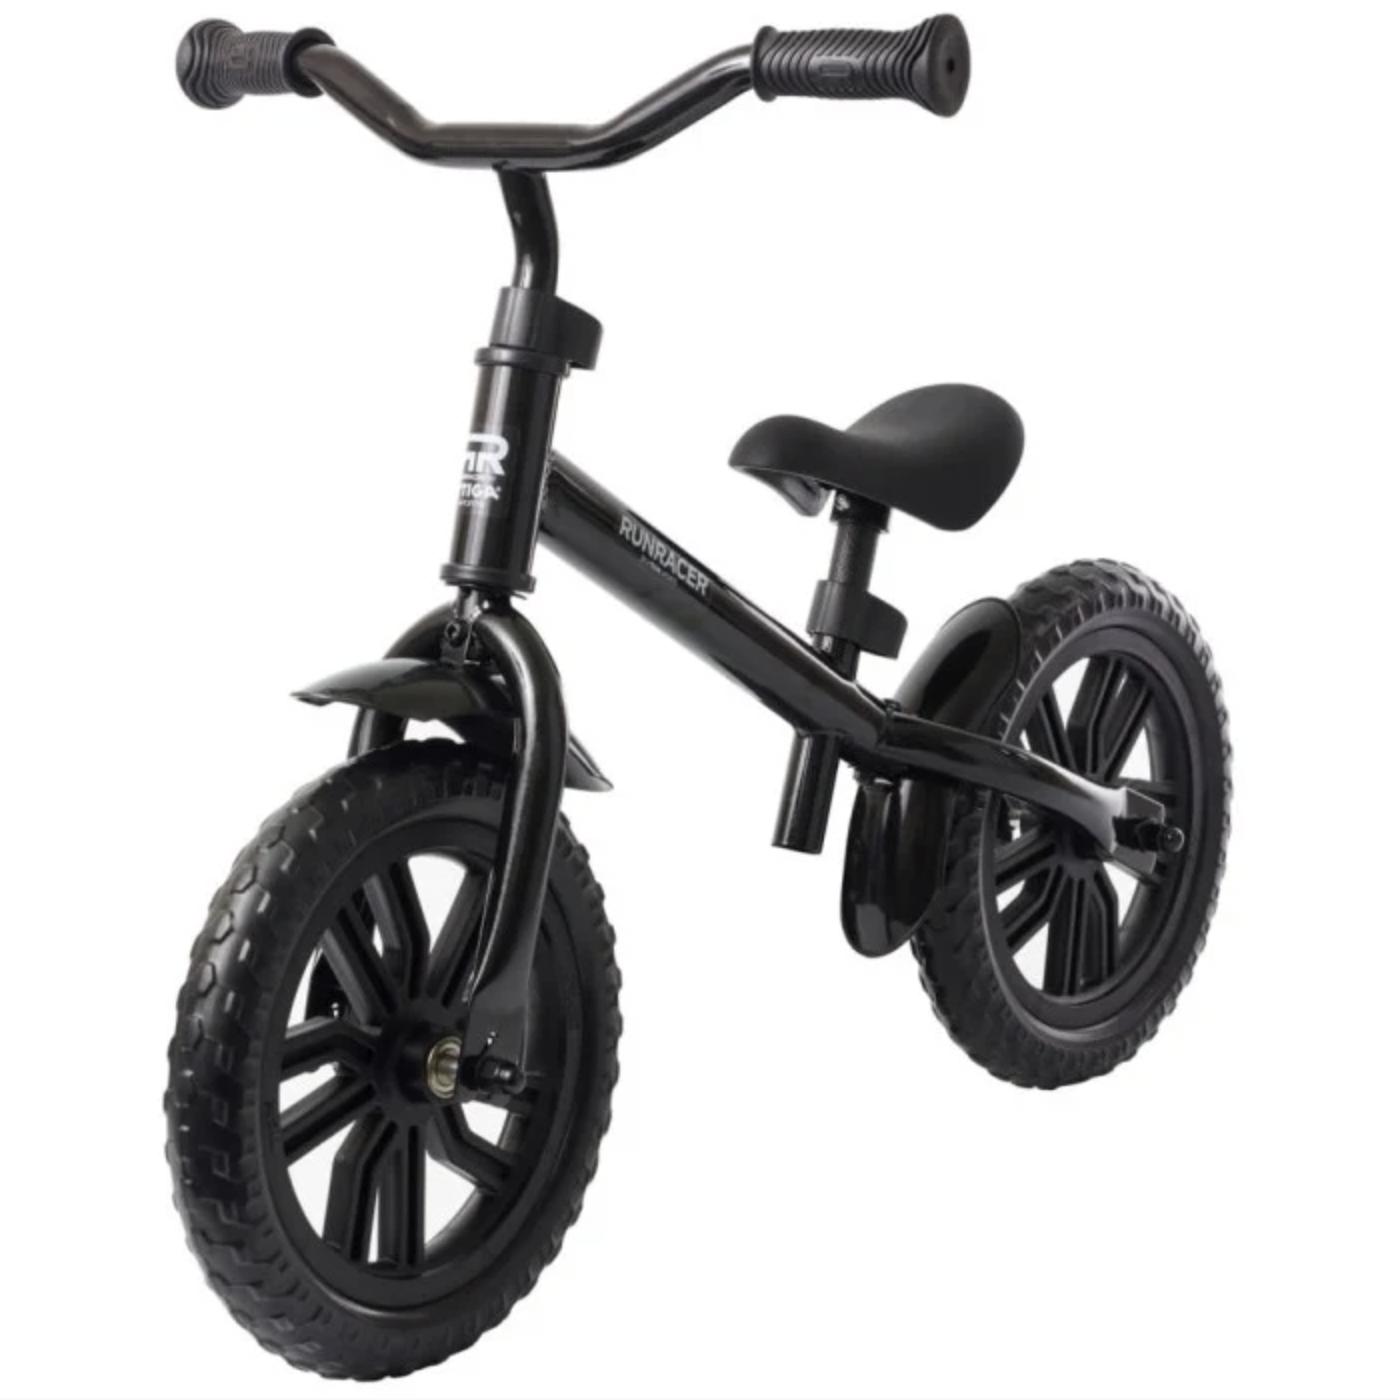 STIGA Runracer C12 Springcykel